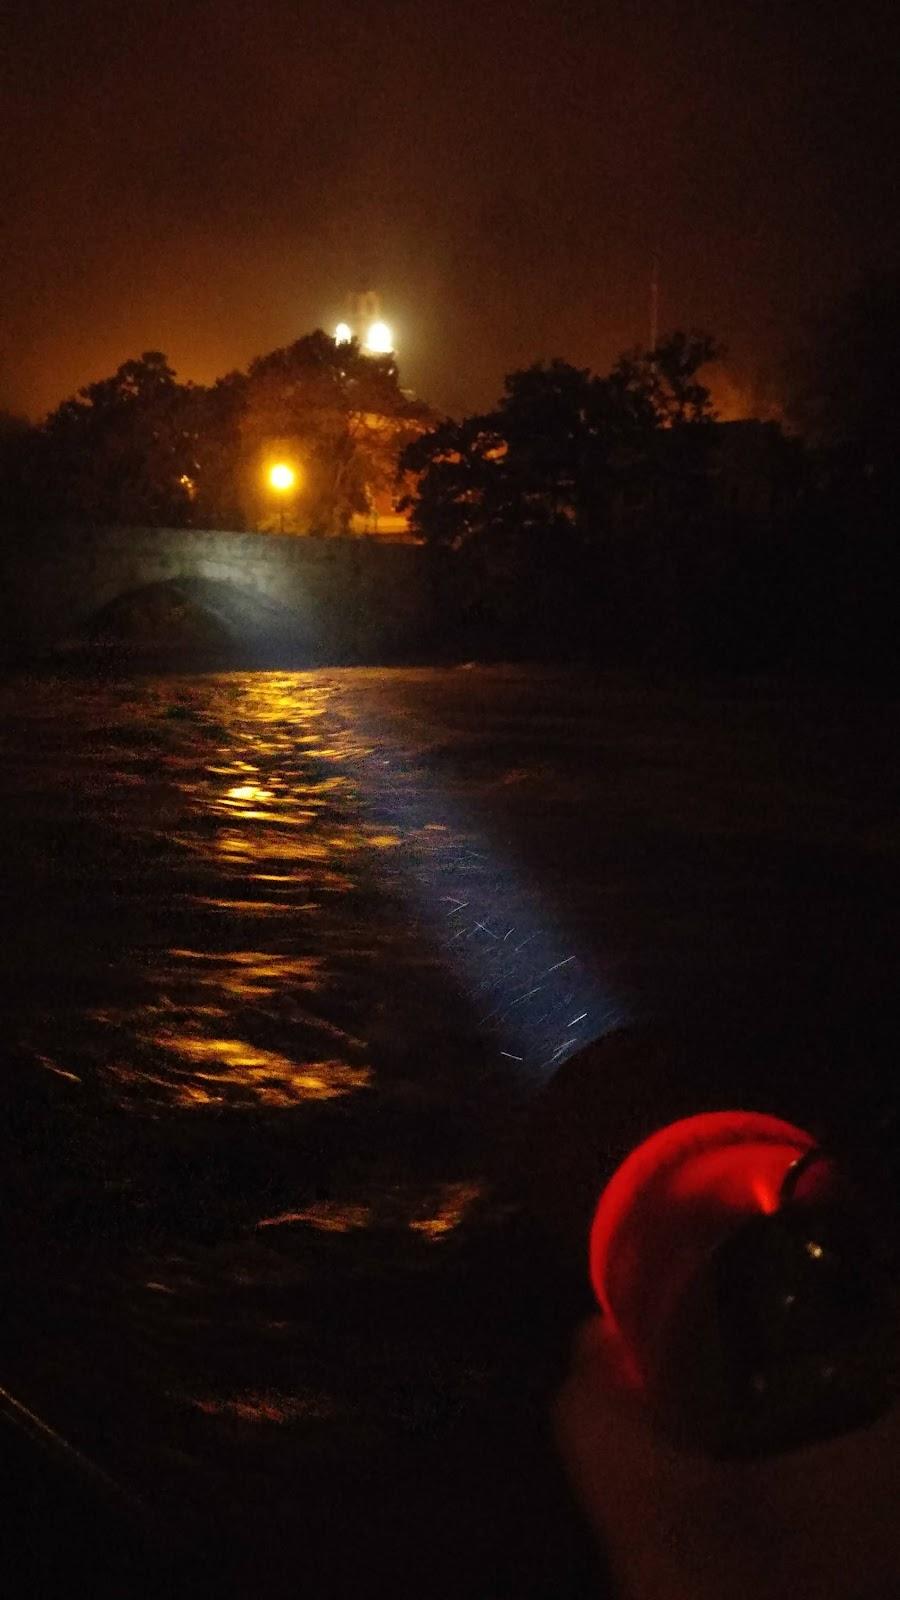 FoxFury Breakthrough BT2+ Flashlight Shines across Turkey River